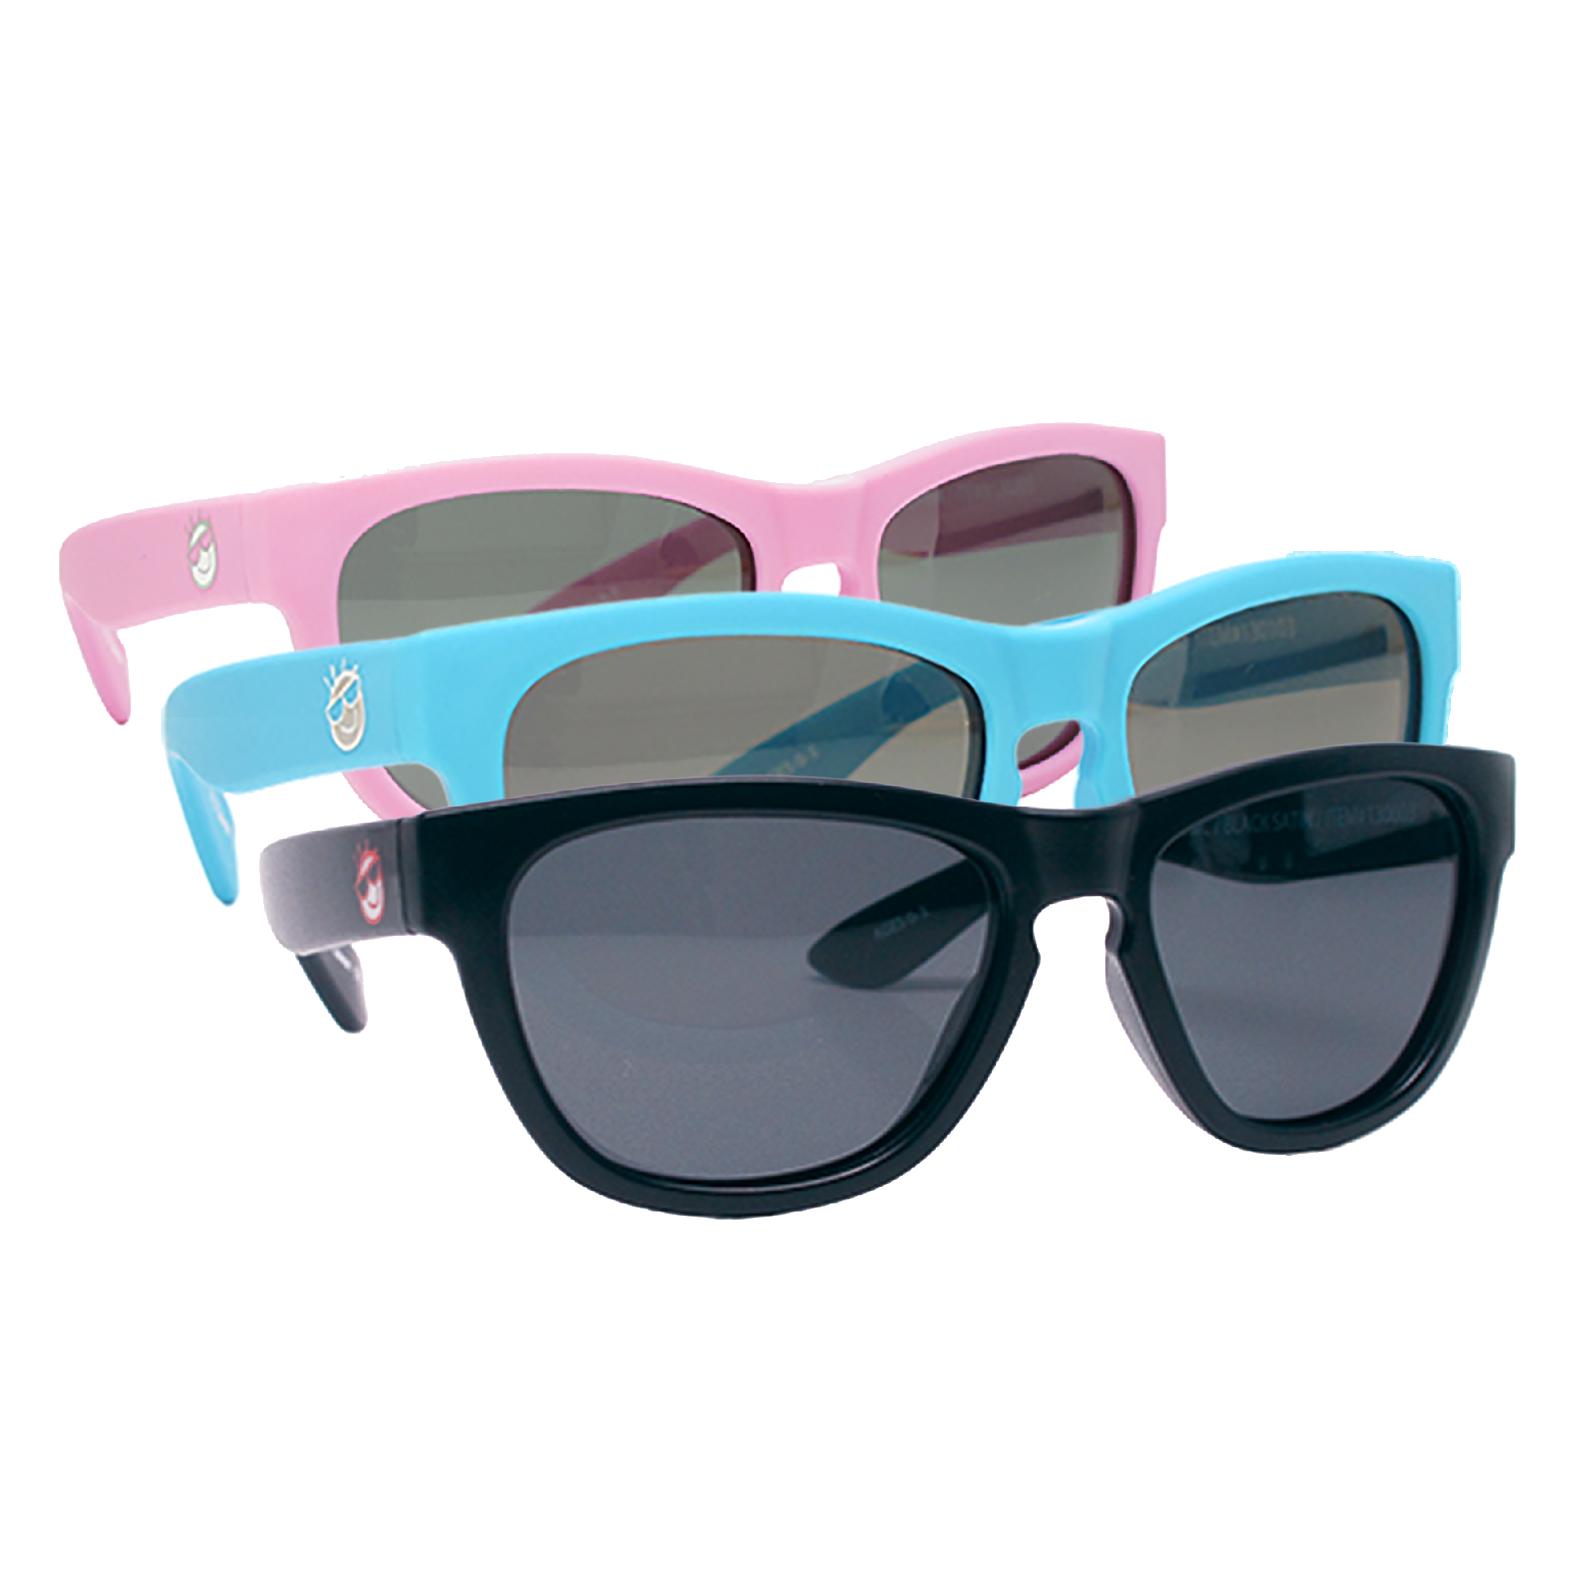 K's Reflekt Polarized Classic Mini Shades, 0-3-1